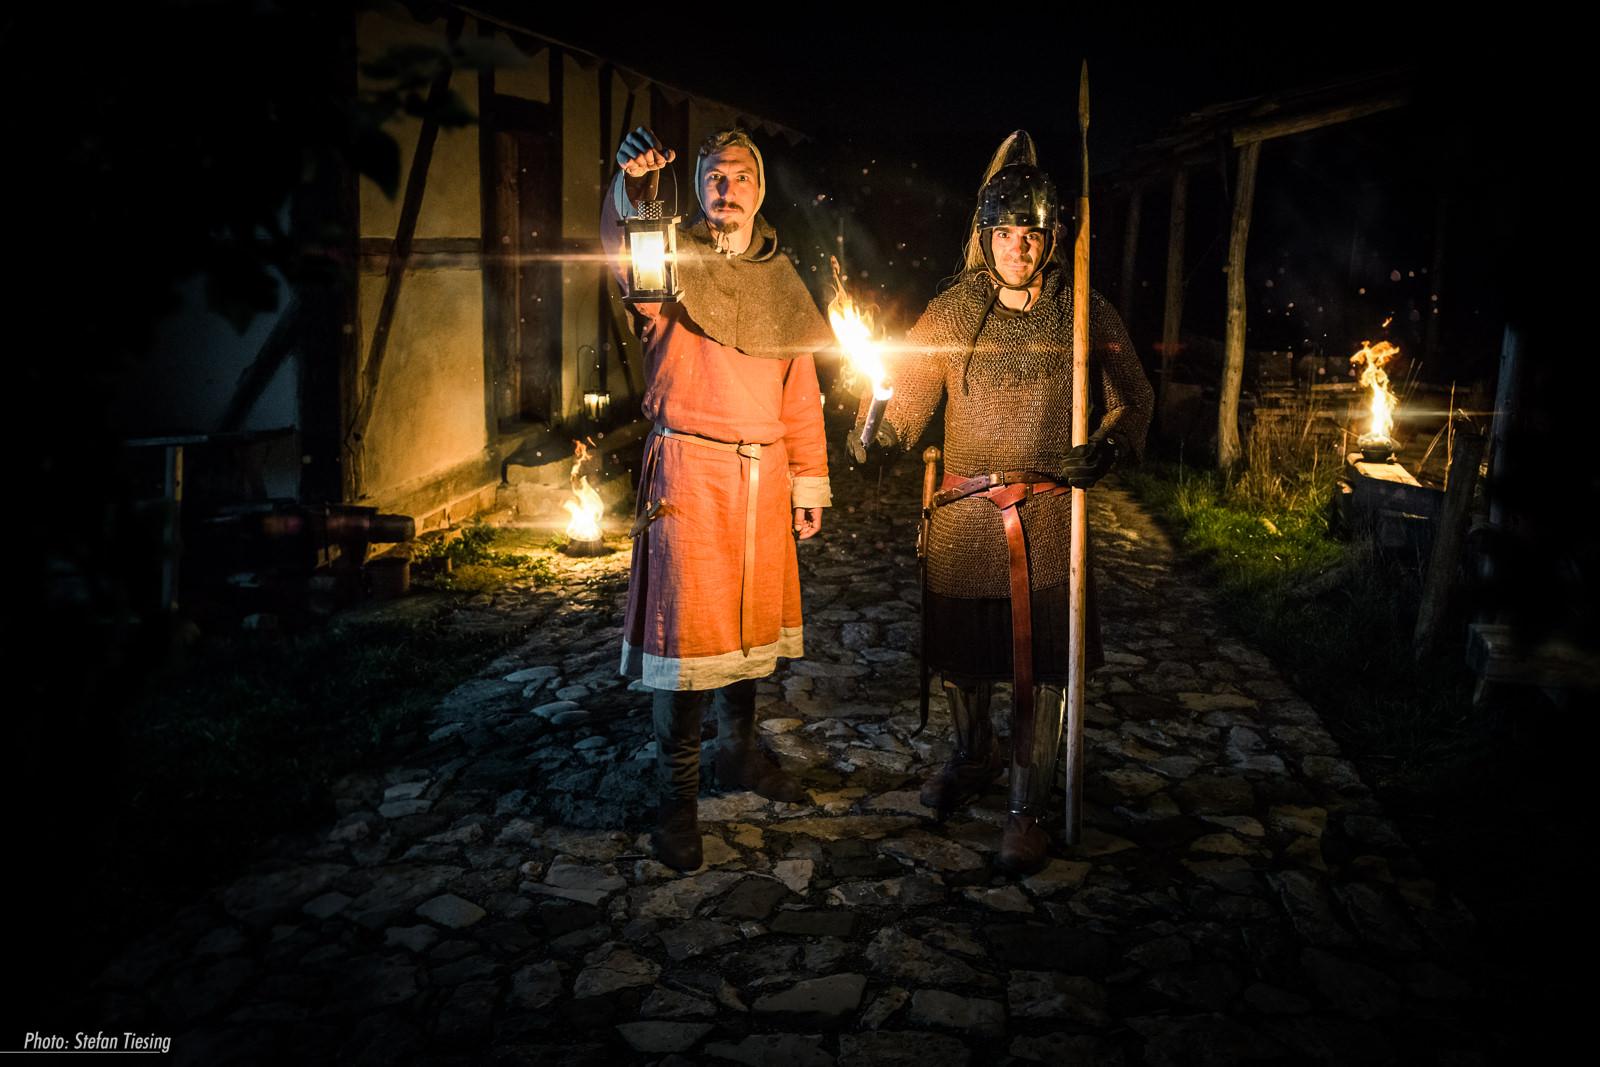 Medieval Night Watch